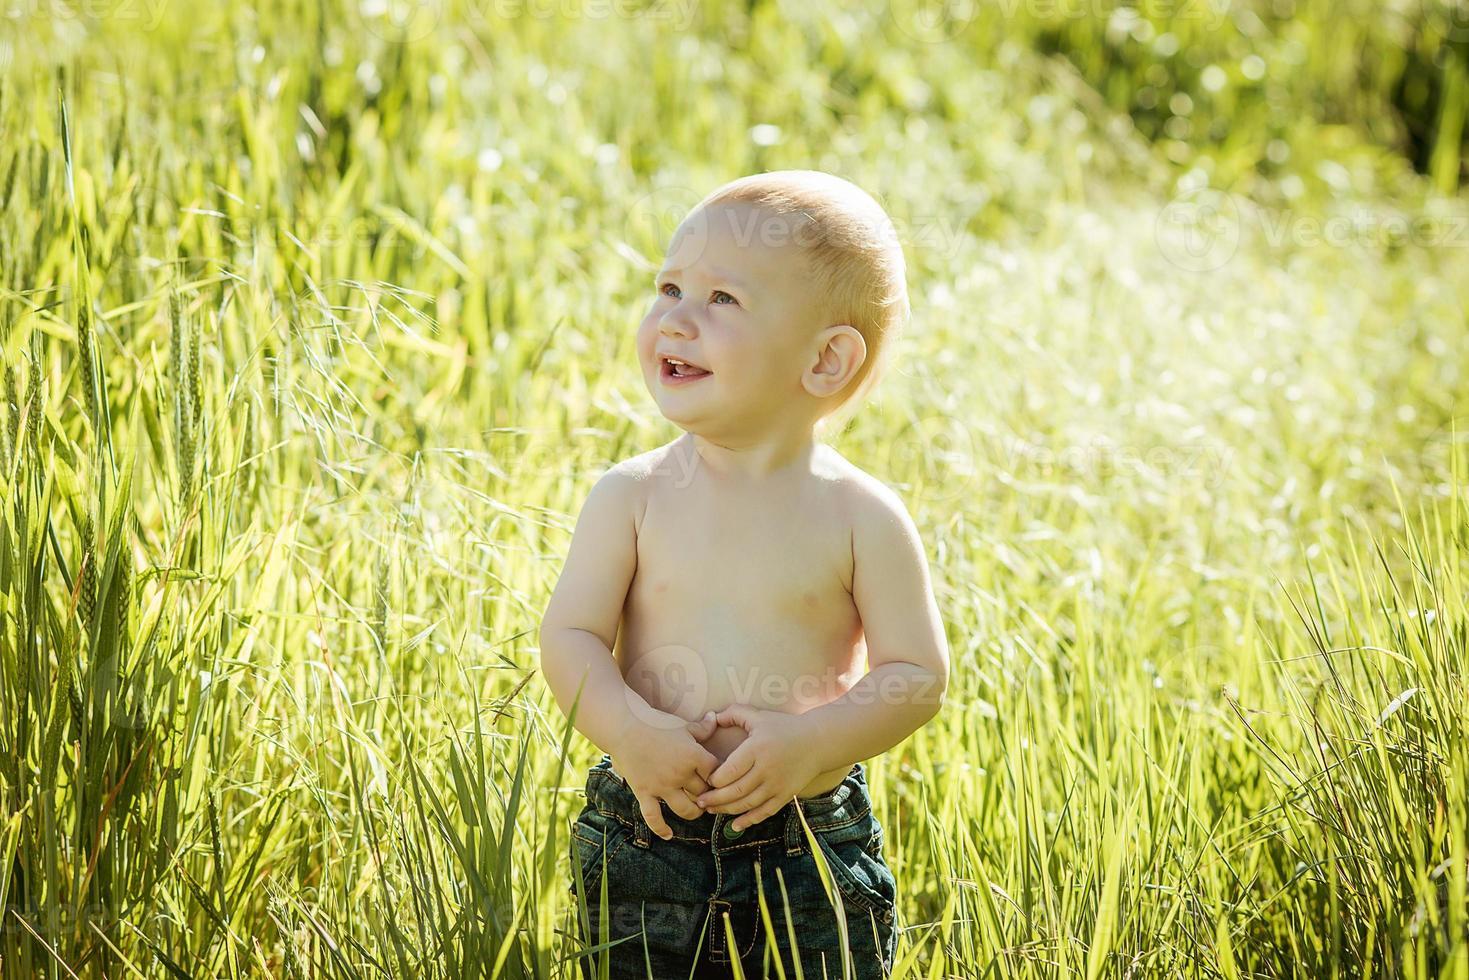 menino no gramado, foto